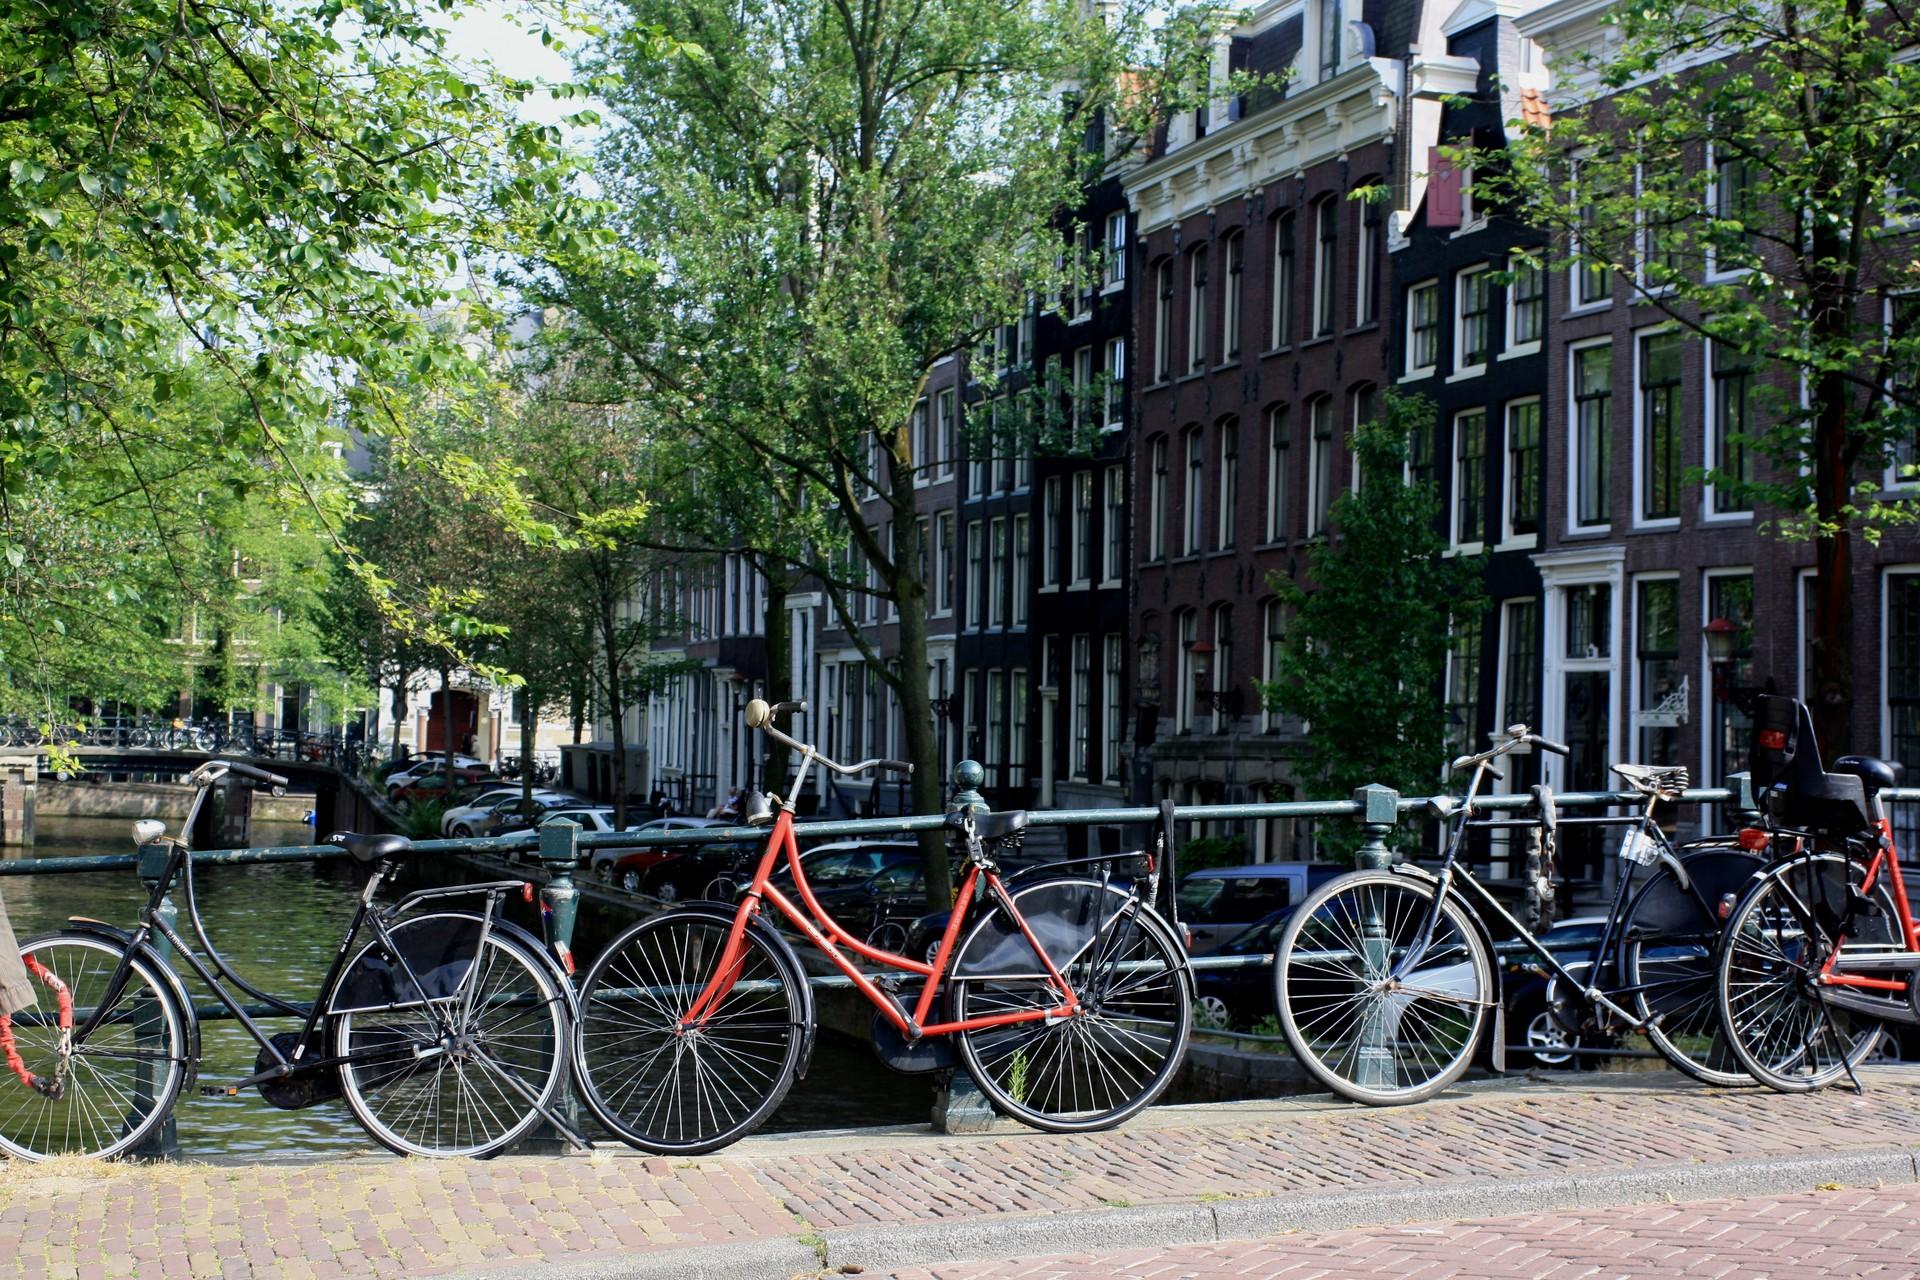 Esperienza Erasmus ad Amsterdam, Paesi Bassi, di Jessica